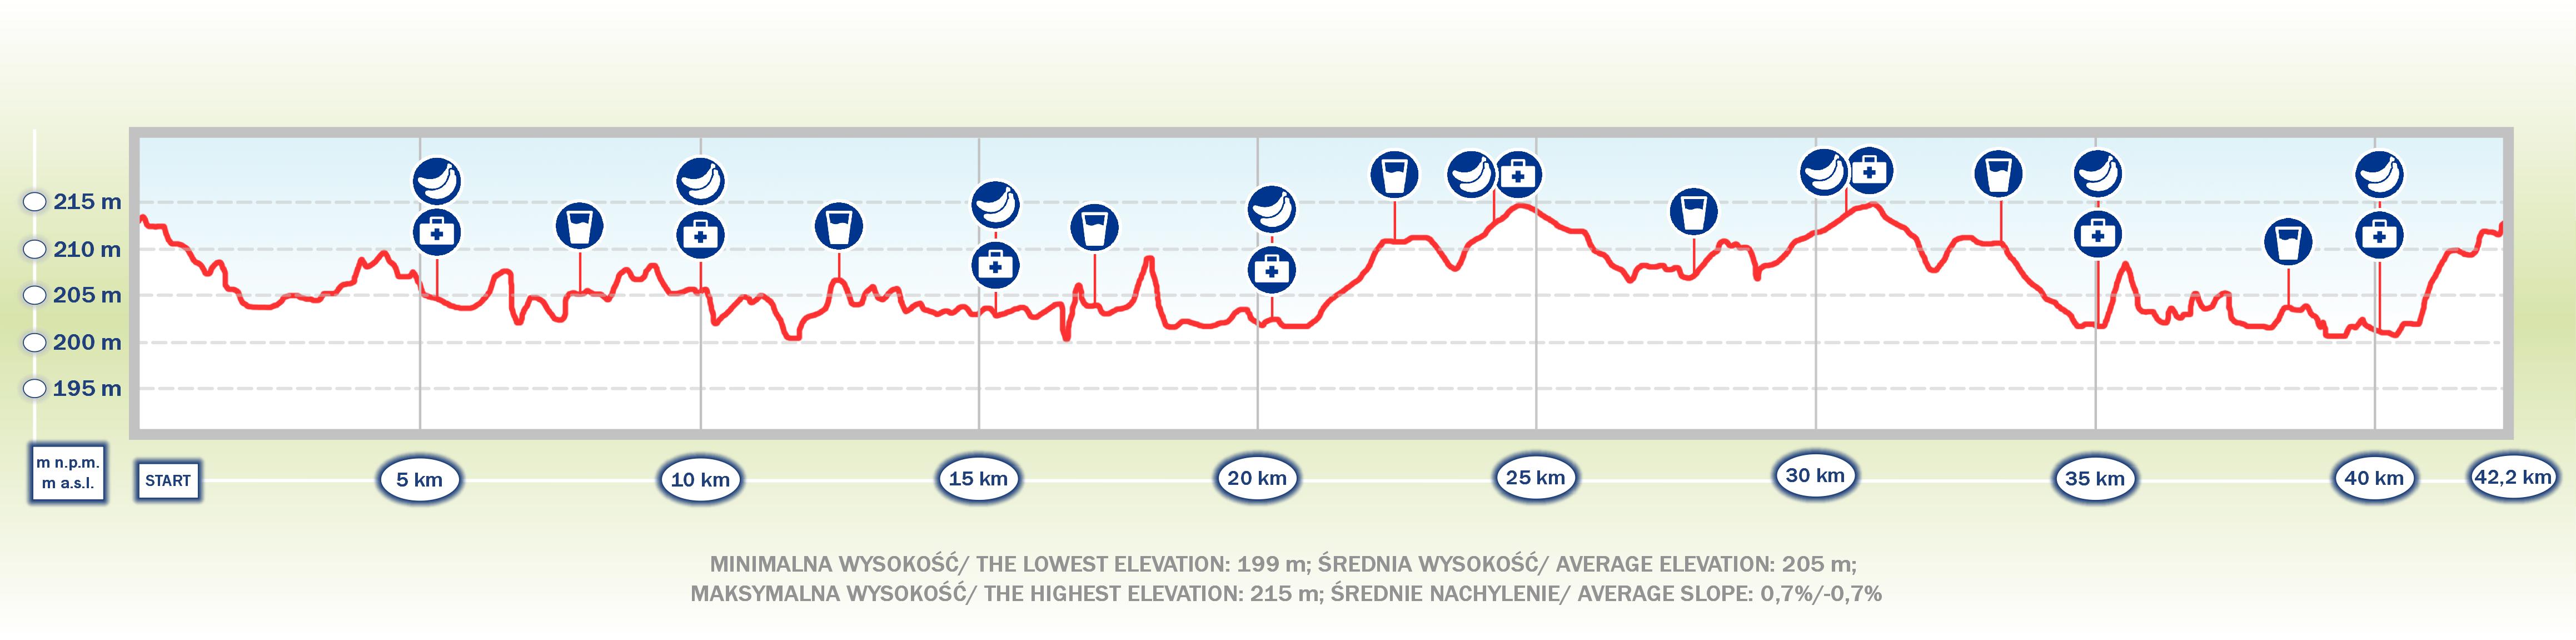 18. Cracovia Maraton - profil topograficzny